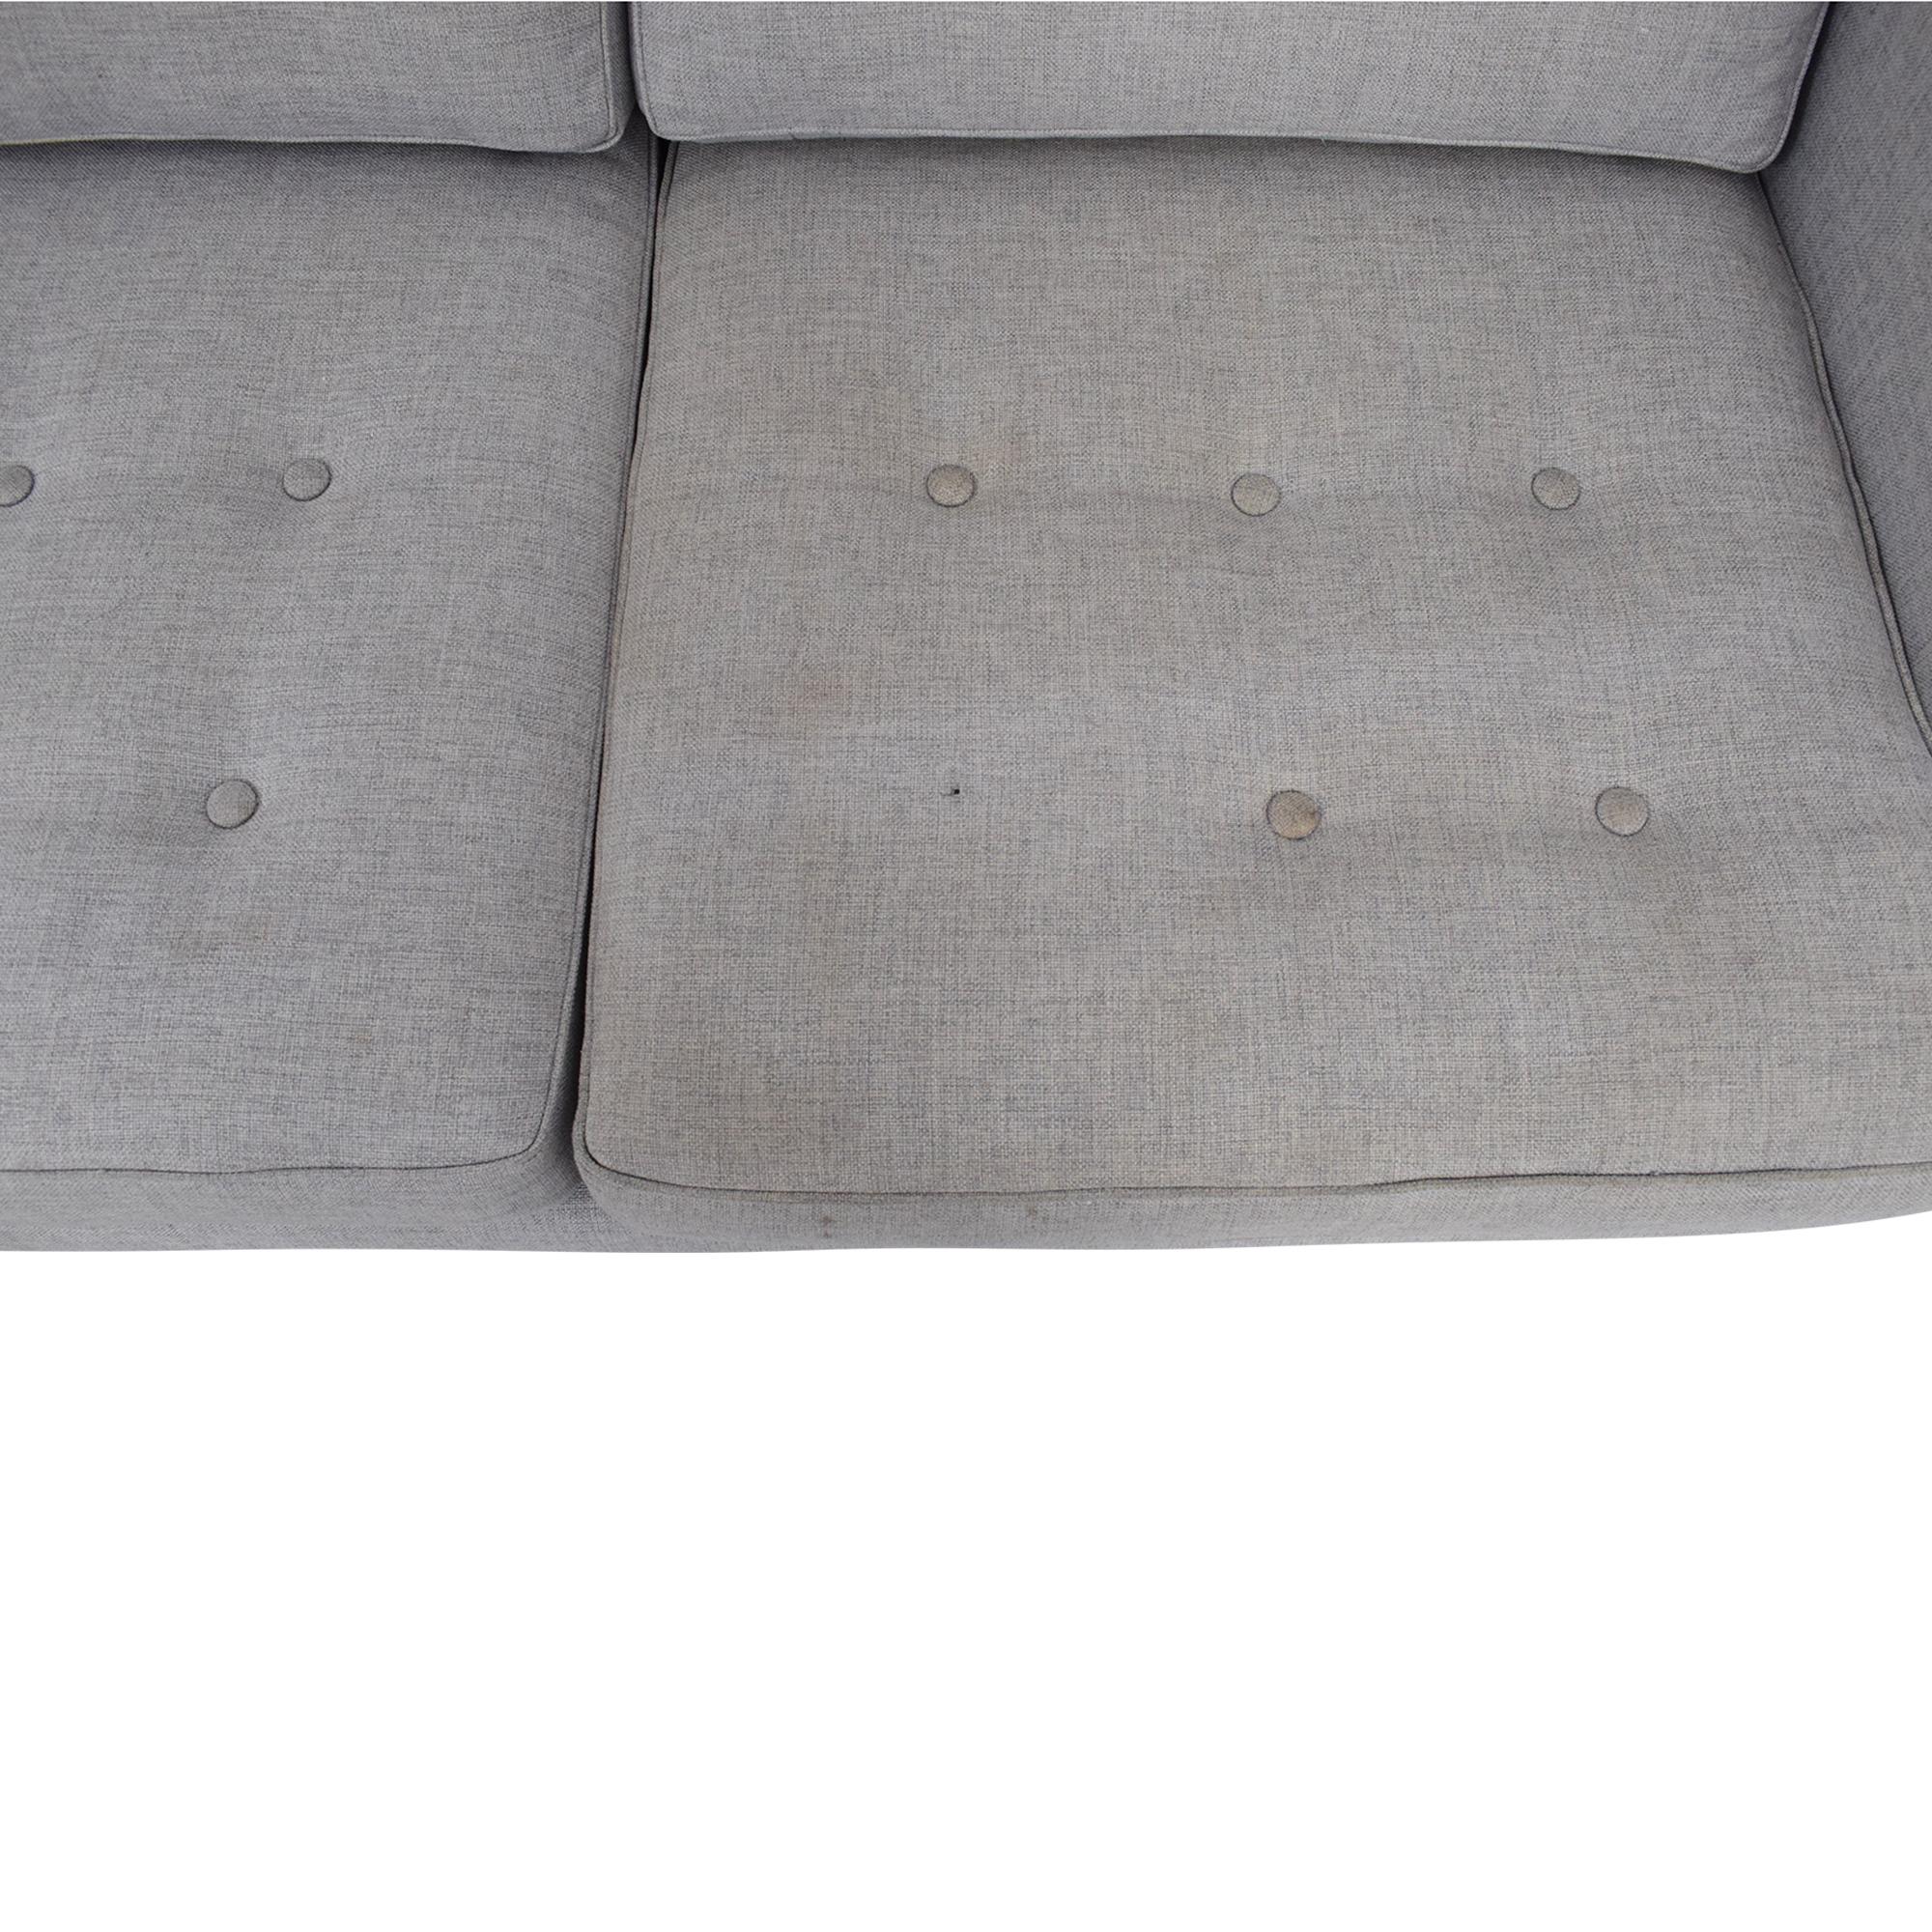 West Elm West Elm Peggy Mid-Century Chaise Sectional Sofa nj